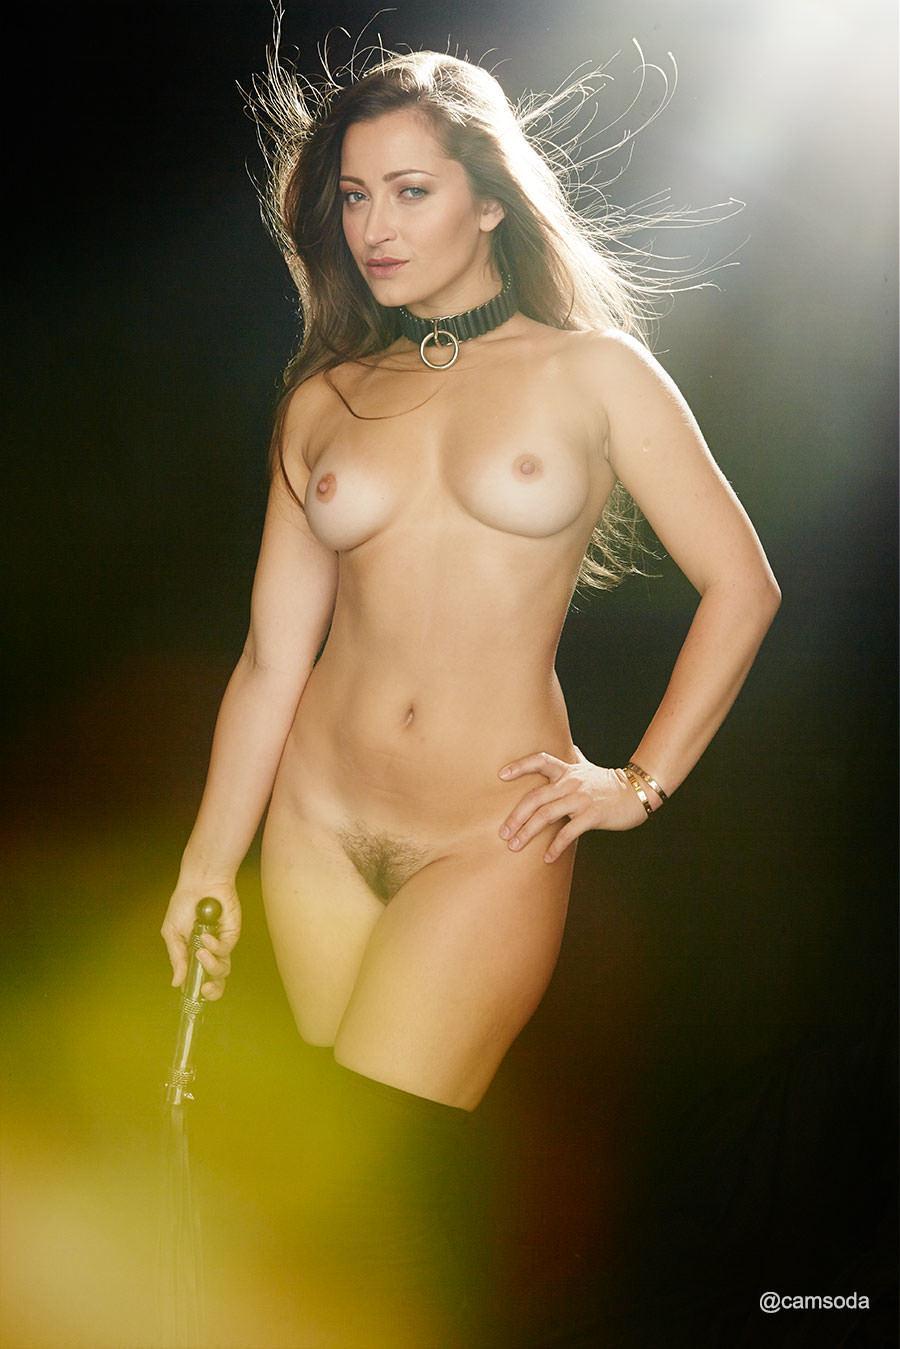 blaack nude women and animals